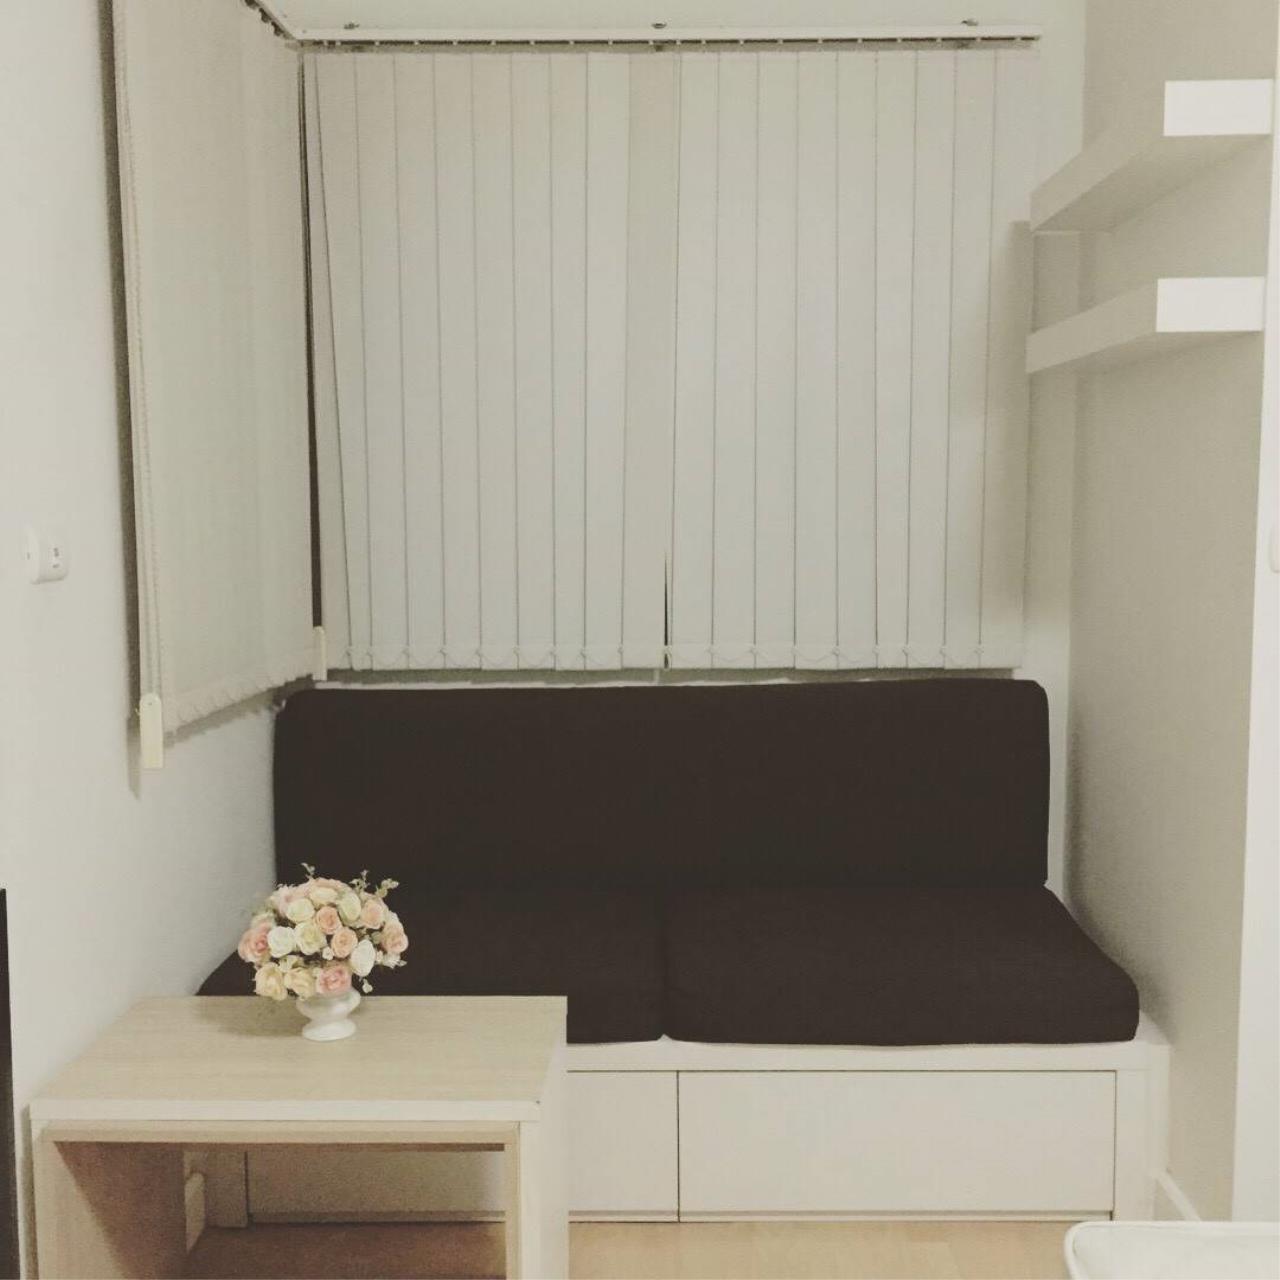 Quality Life Property Agency's R E N T ! My Condo Sukhumvit 52 | Studio 1 BATH | 25 SQ. M. 4